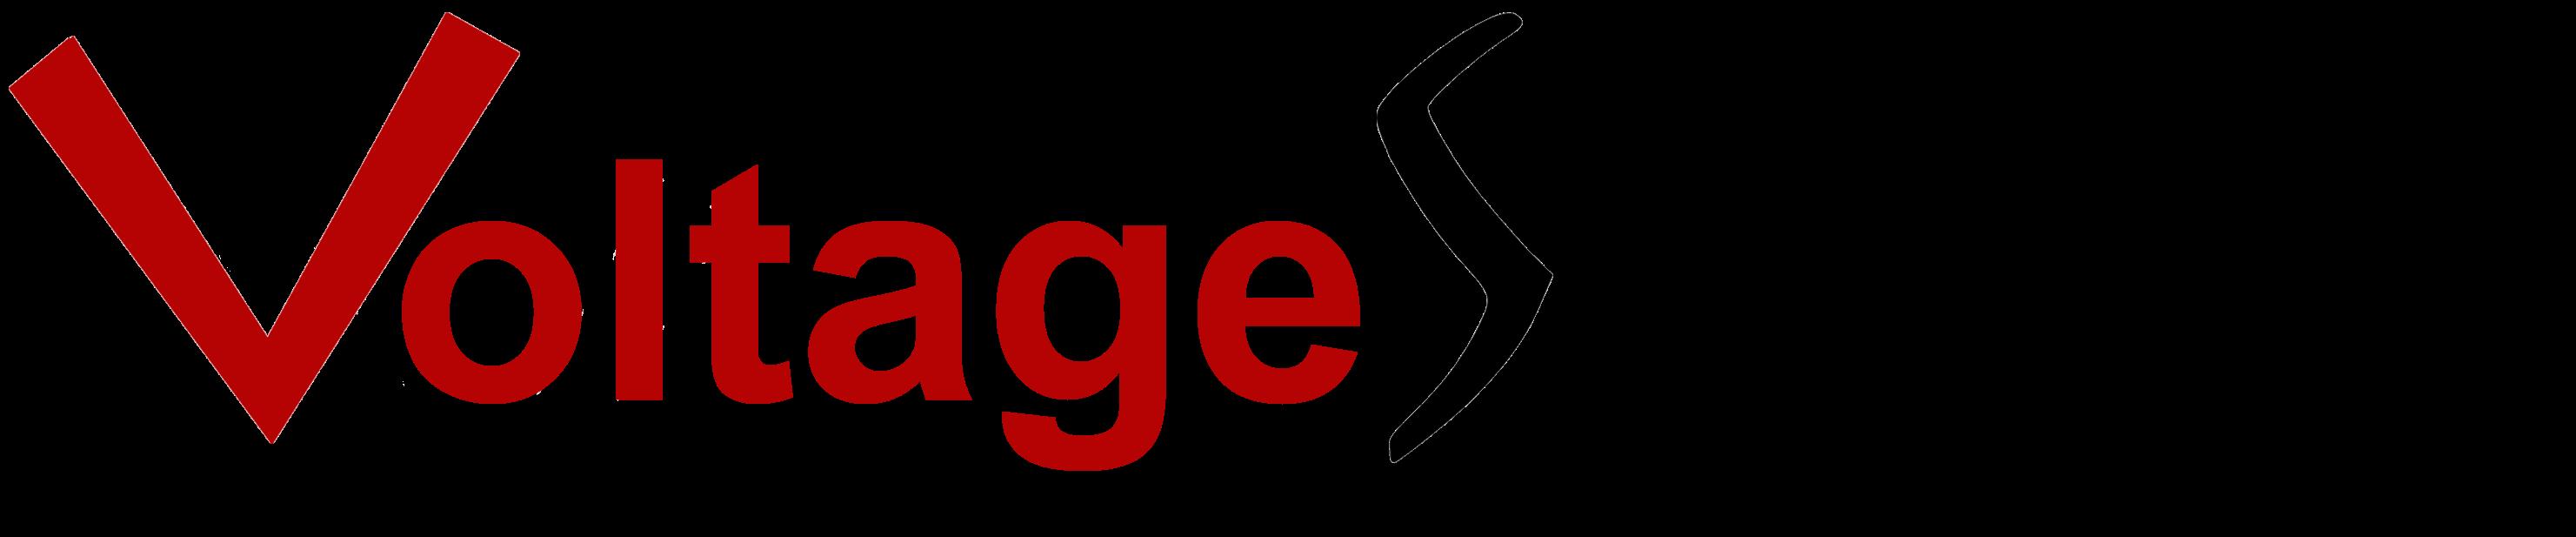 Voltage Solutions